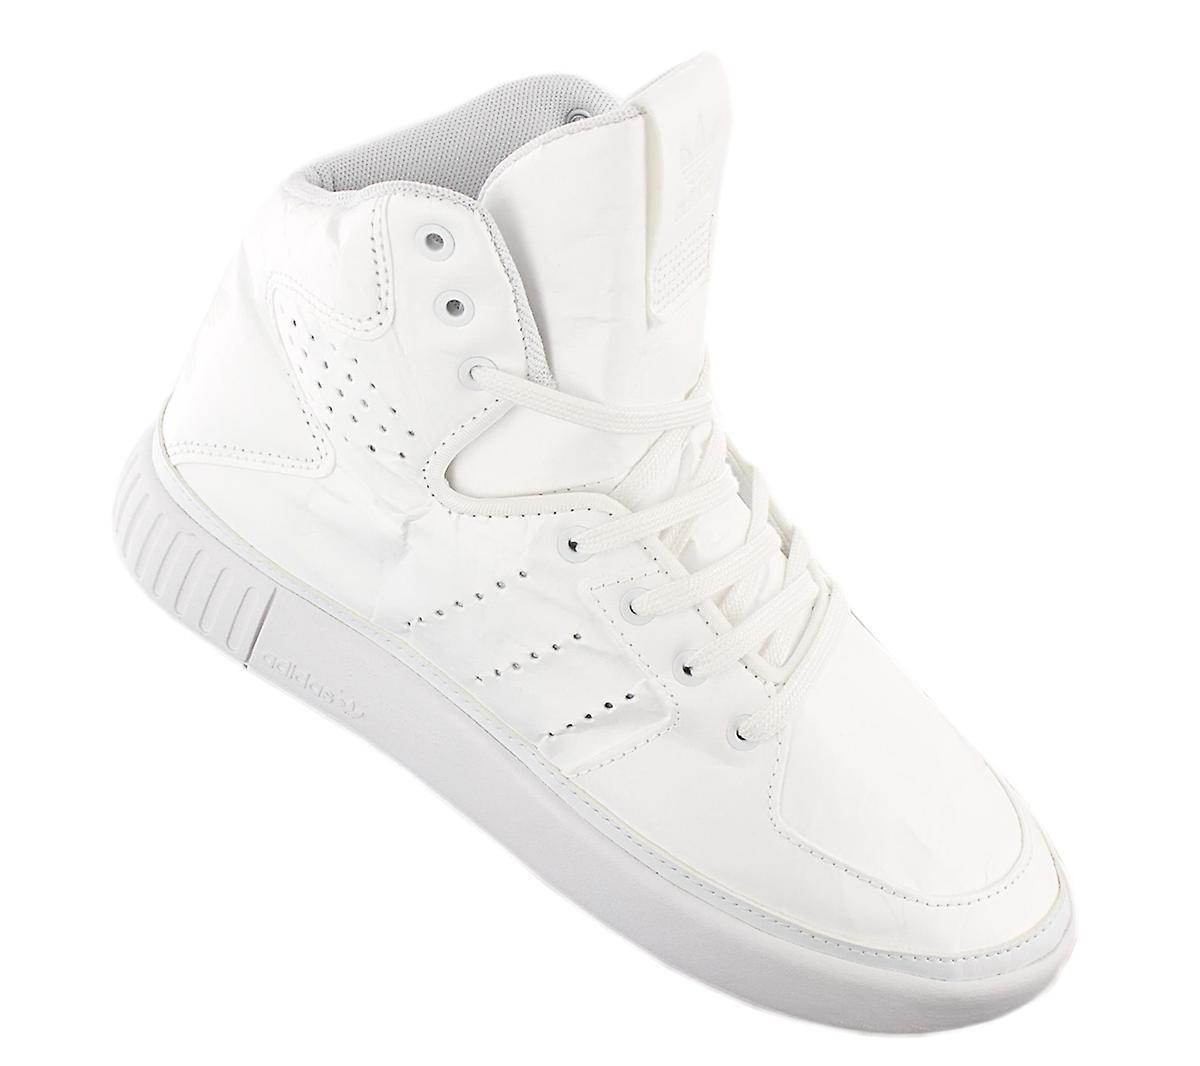 adidas Originals Tubular Invader 2.0 Decon - Damen Hi Top Schuhe Weiß BB2073 Sneakers Sportschuhe 5VWpb